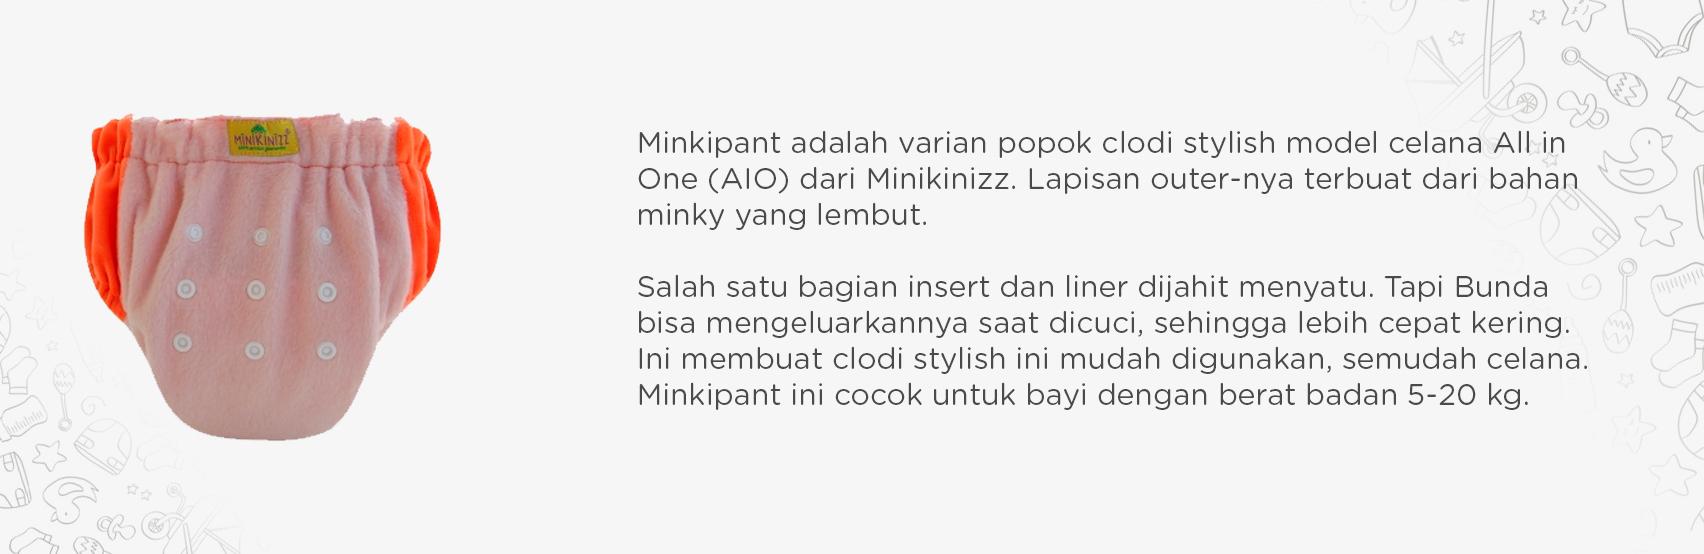 Minkipant - Sweety Peach